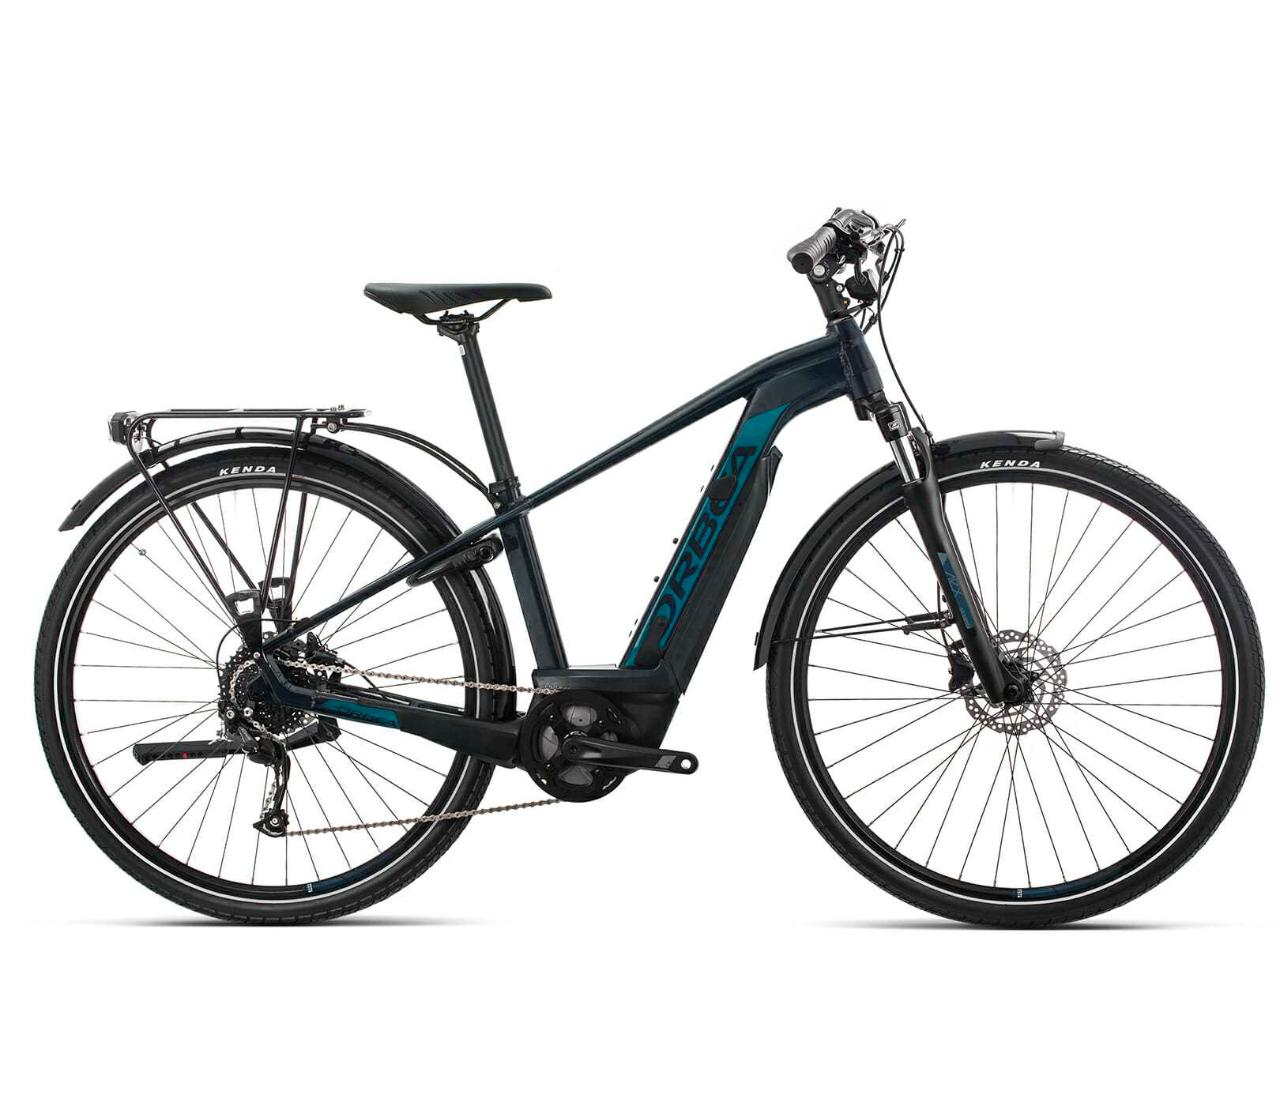 Orbea Keram Comfort Hybrid Electric Bike 49-52